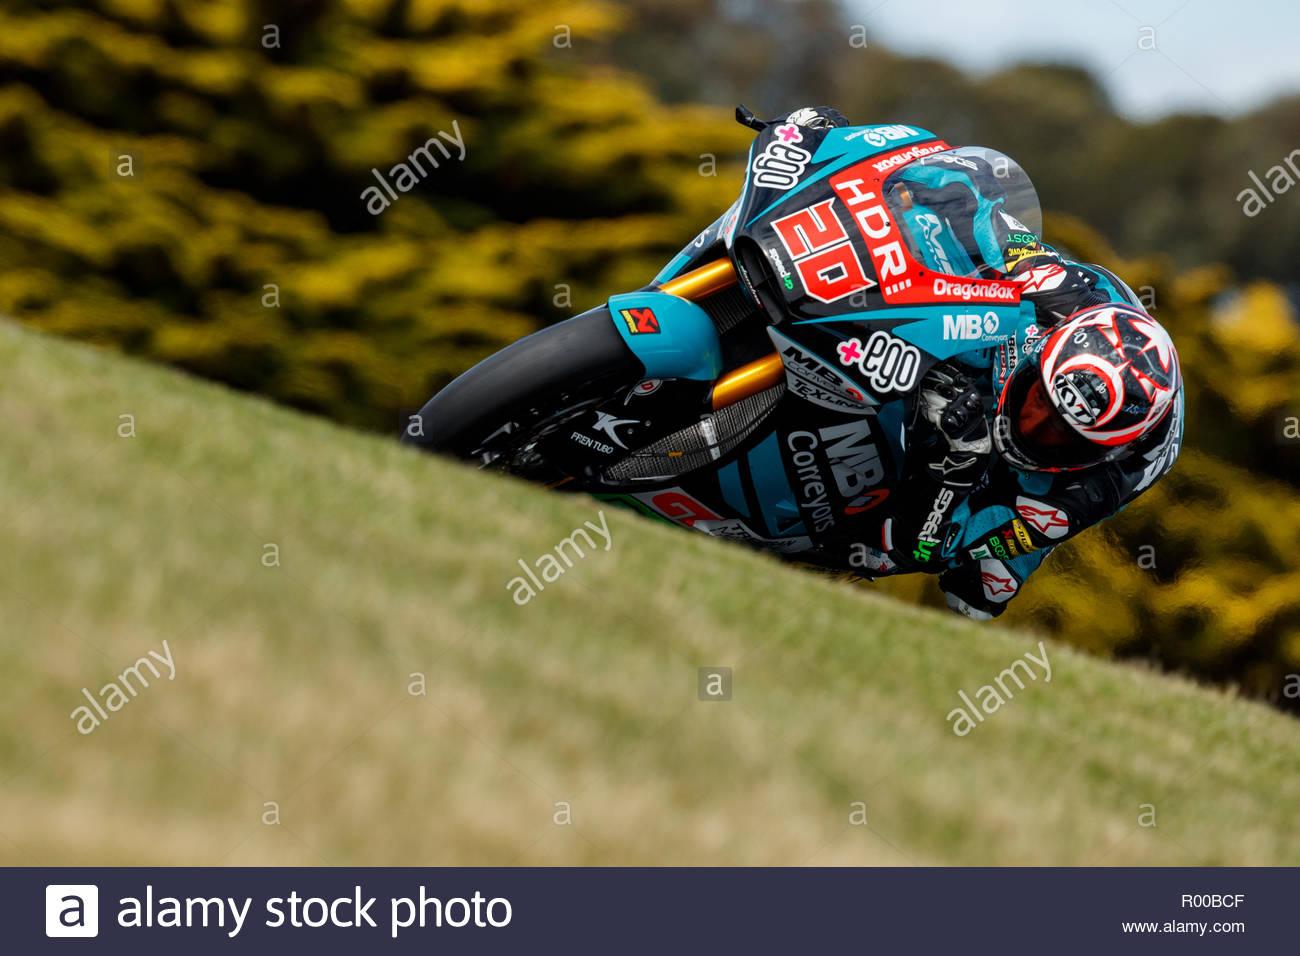 Friday 26 October 2018 Phillip Island Australia Moto2 Fabio 1300x956